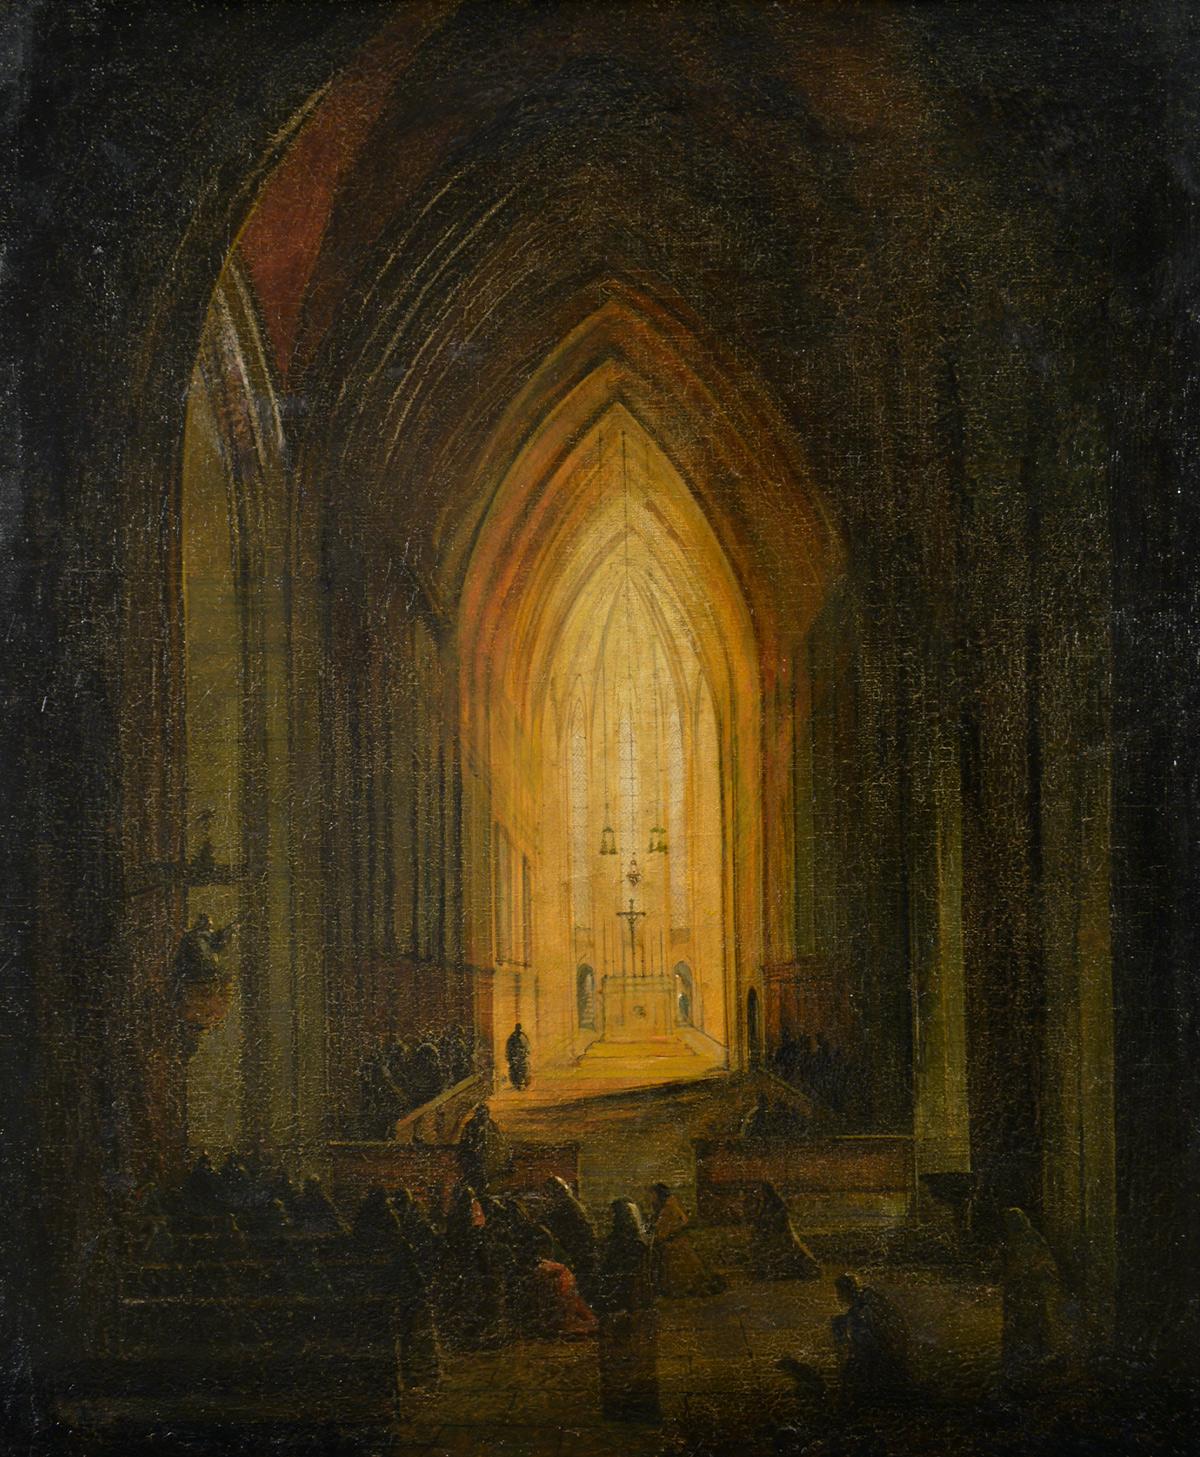 Adolphe Gouhenant painting